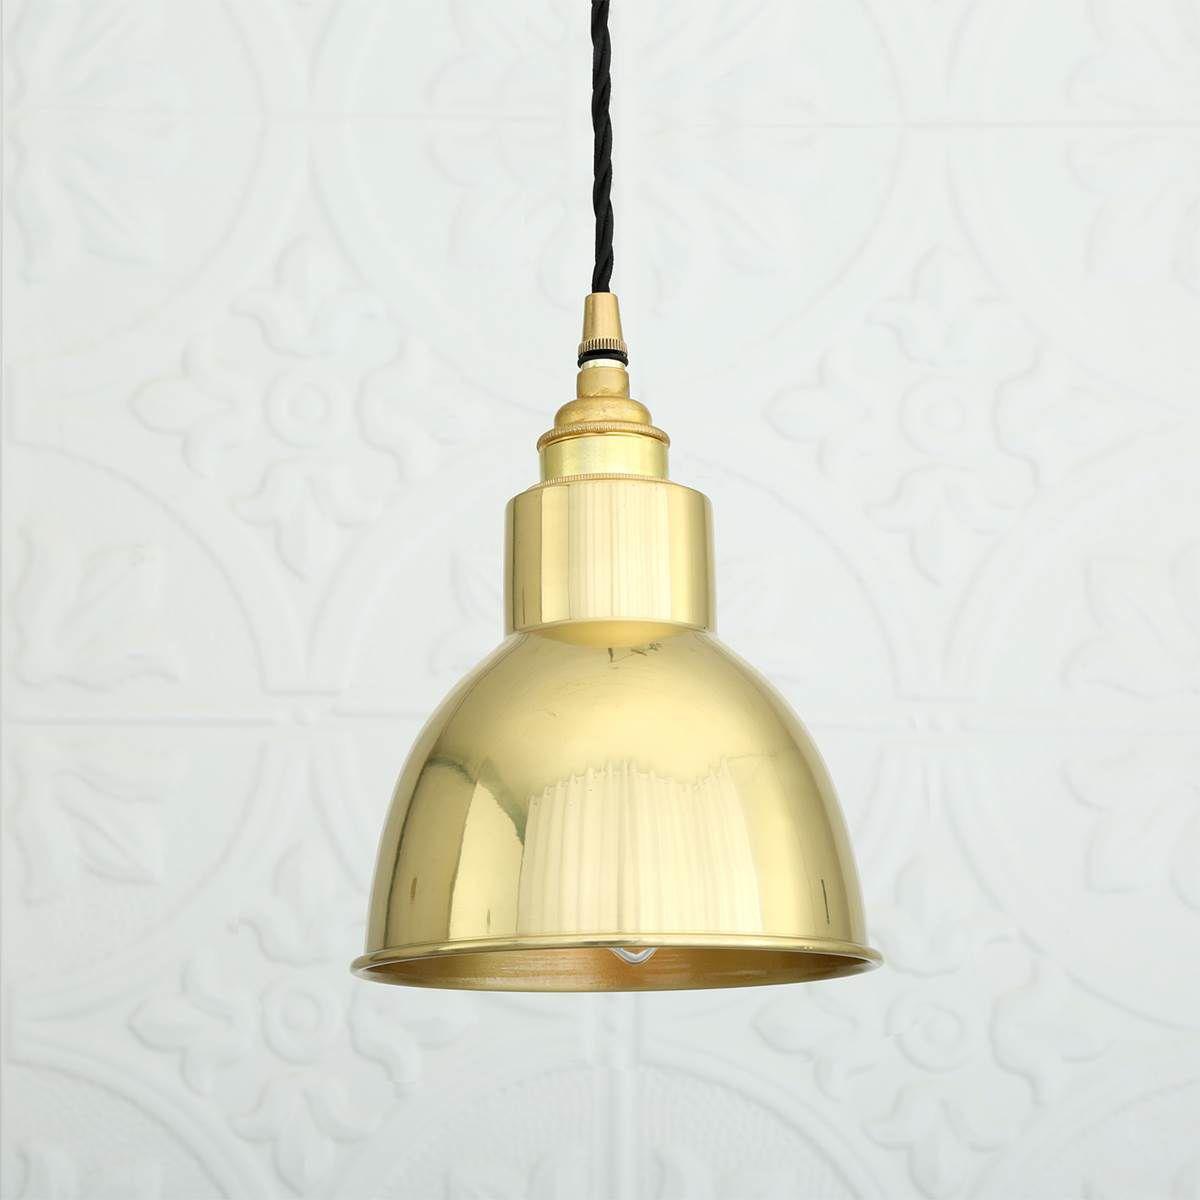 traditional pendant lighting. Pendant Lamp / Traditional Polished Brass Kitchen - SANTIAGO : MLP422 Lighting S